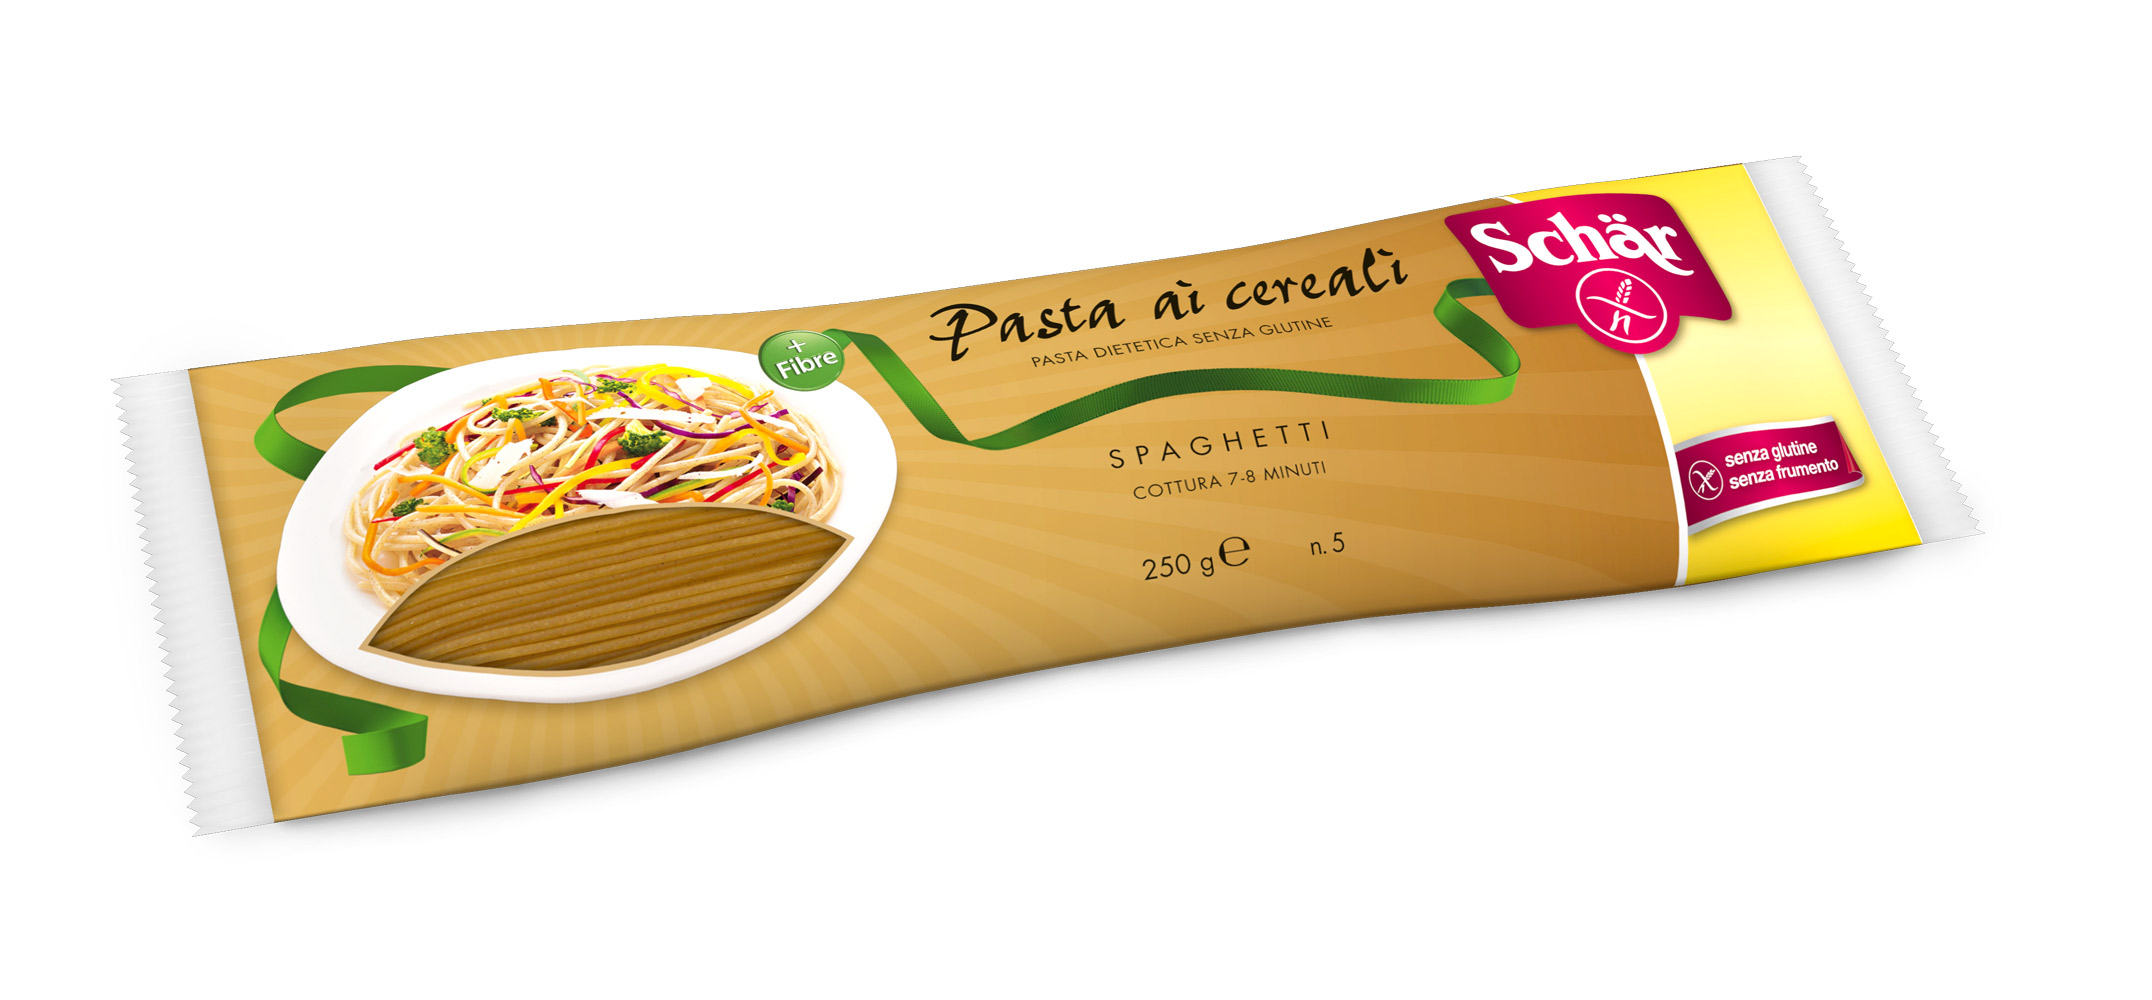 Brezglutenski polnozrnati špageti – Spaghetti ai cereali